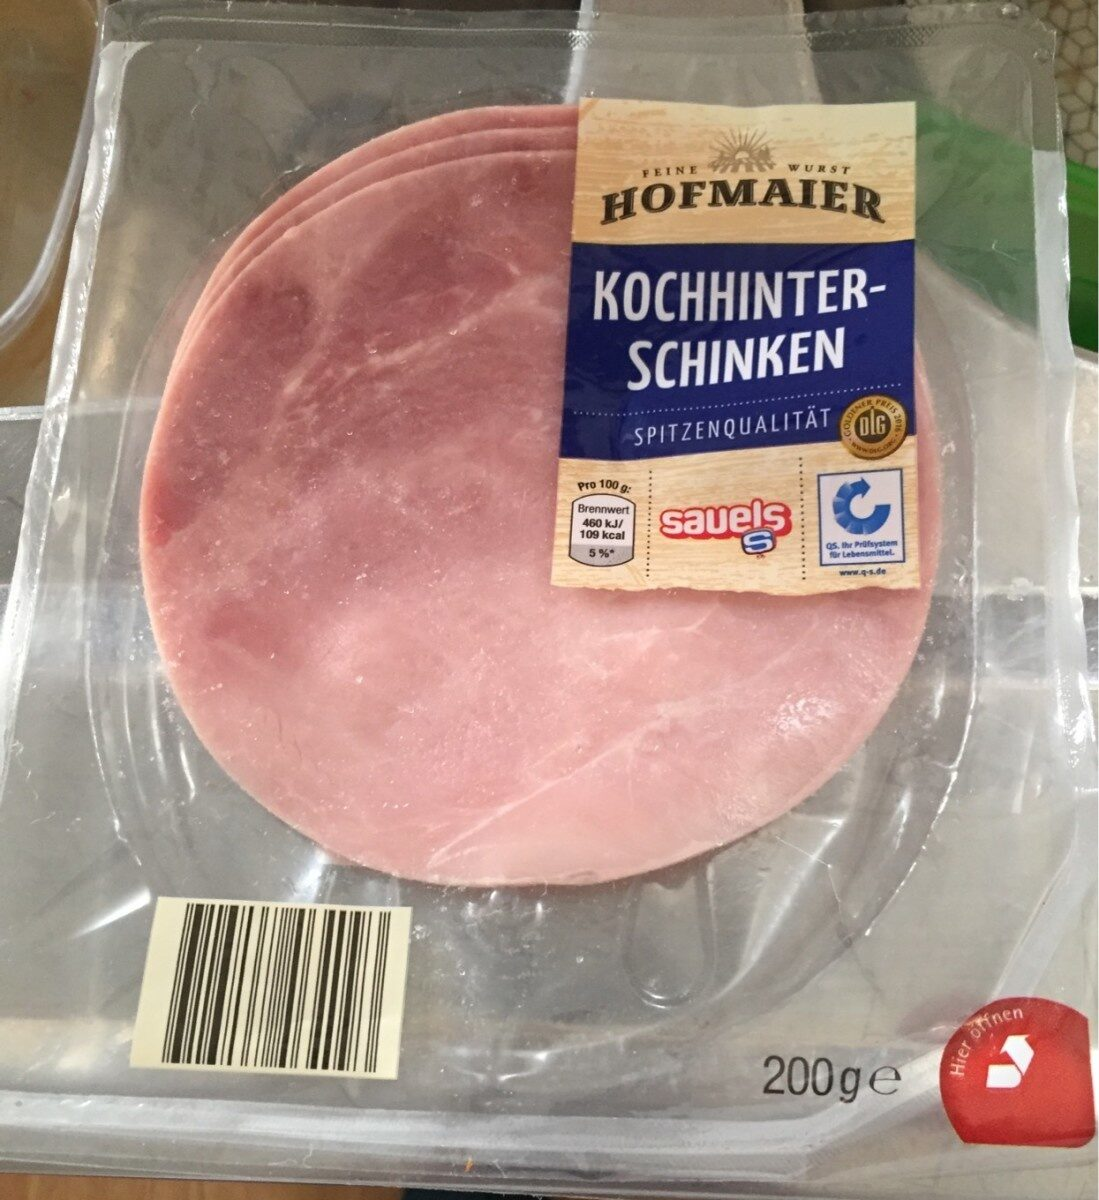 Kochhinterschinken - Produkt - de